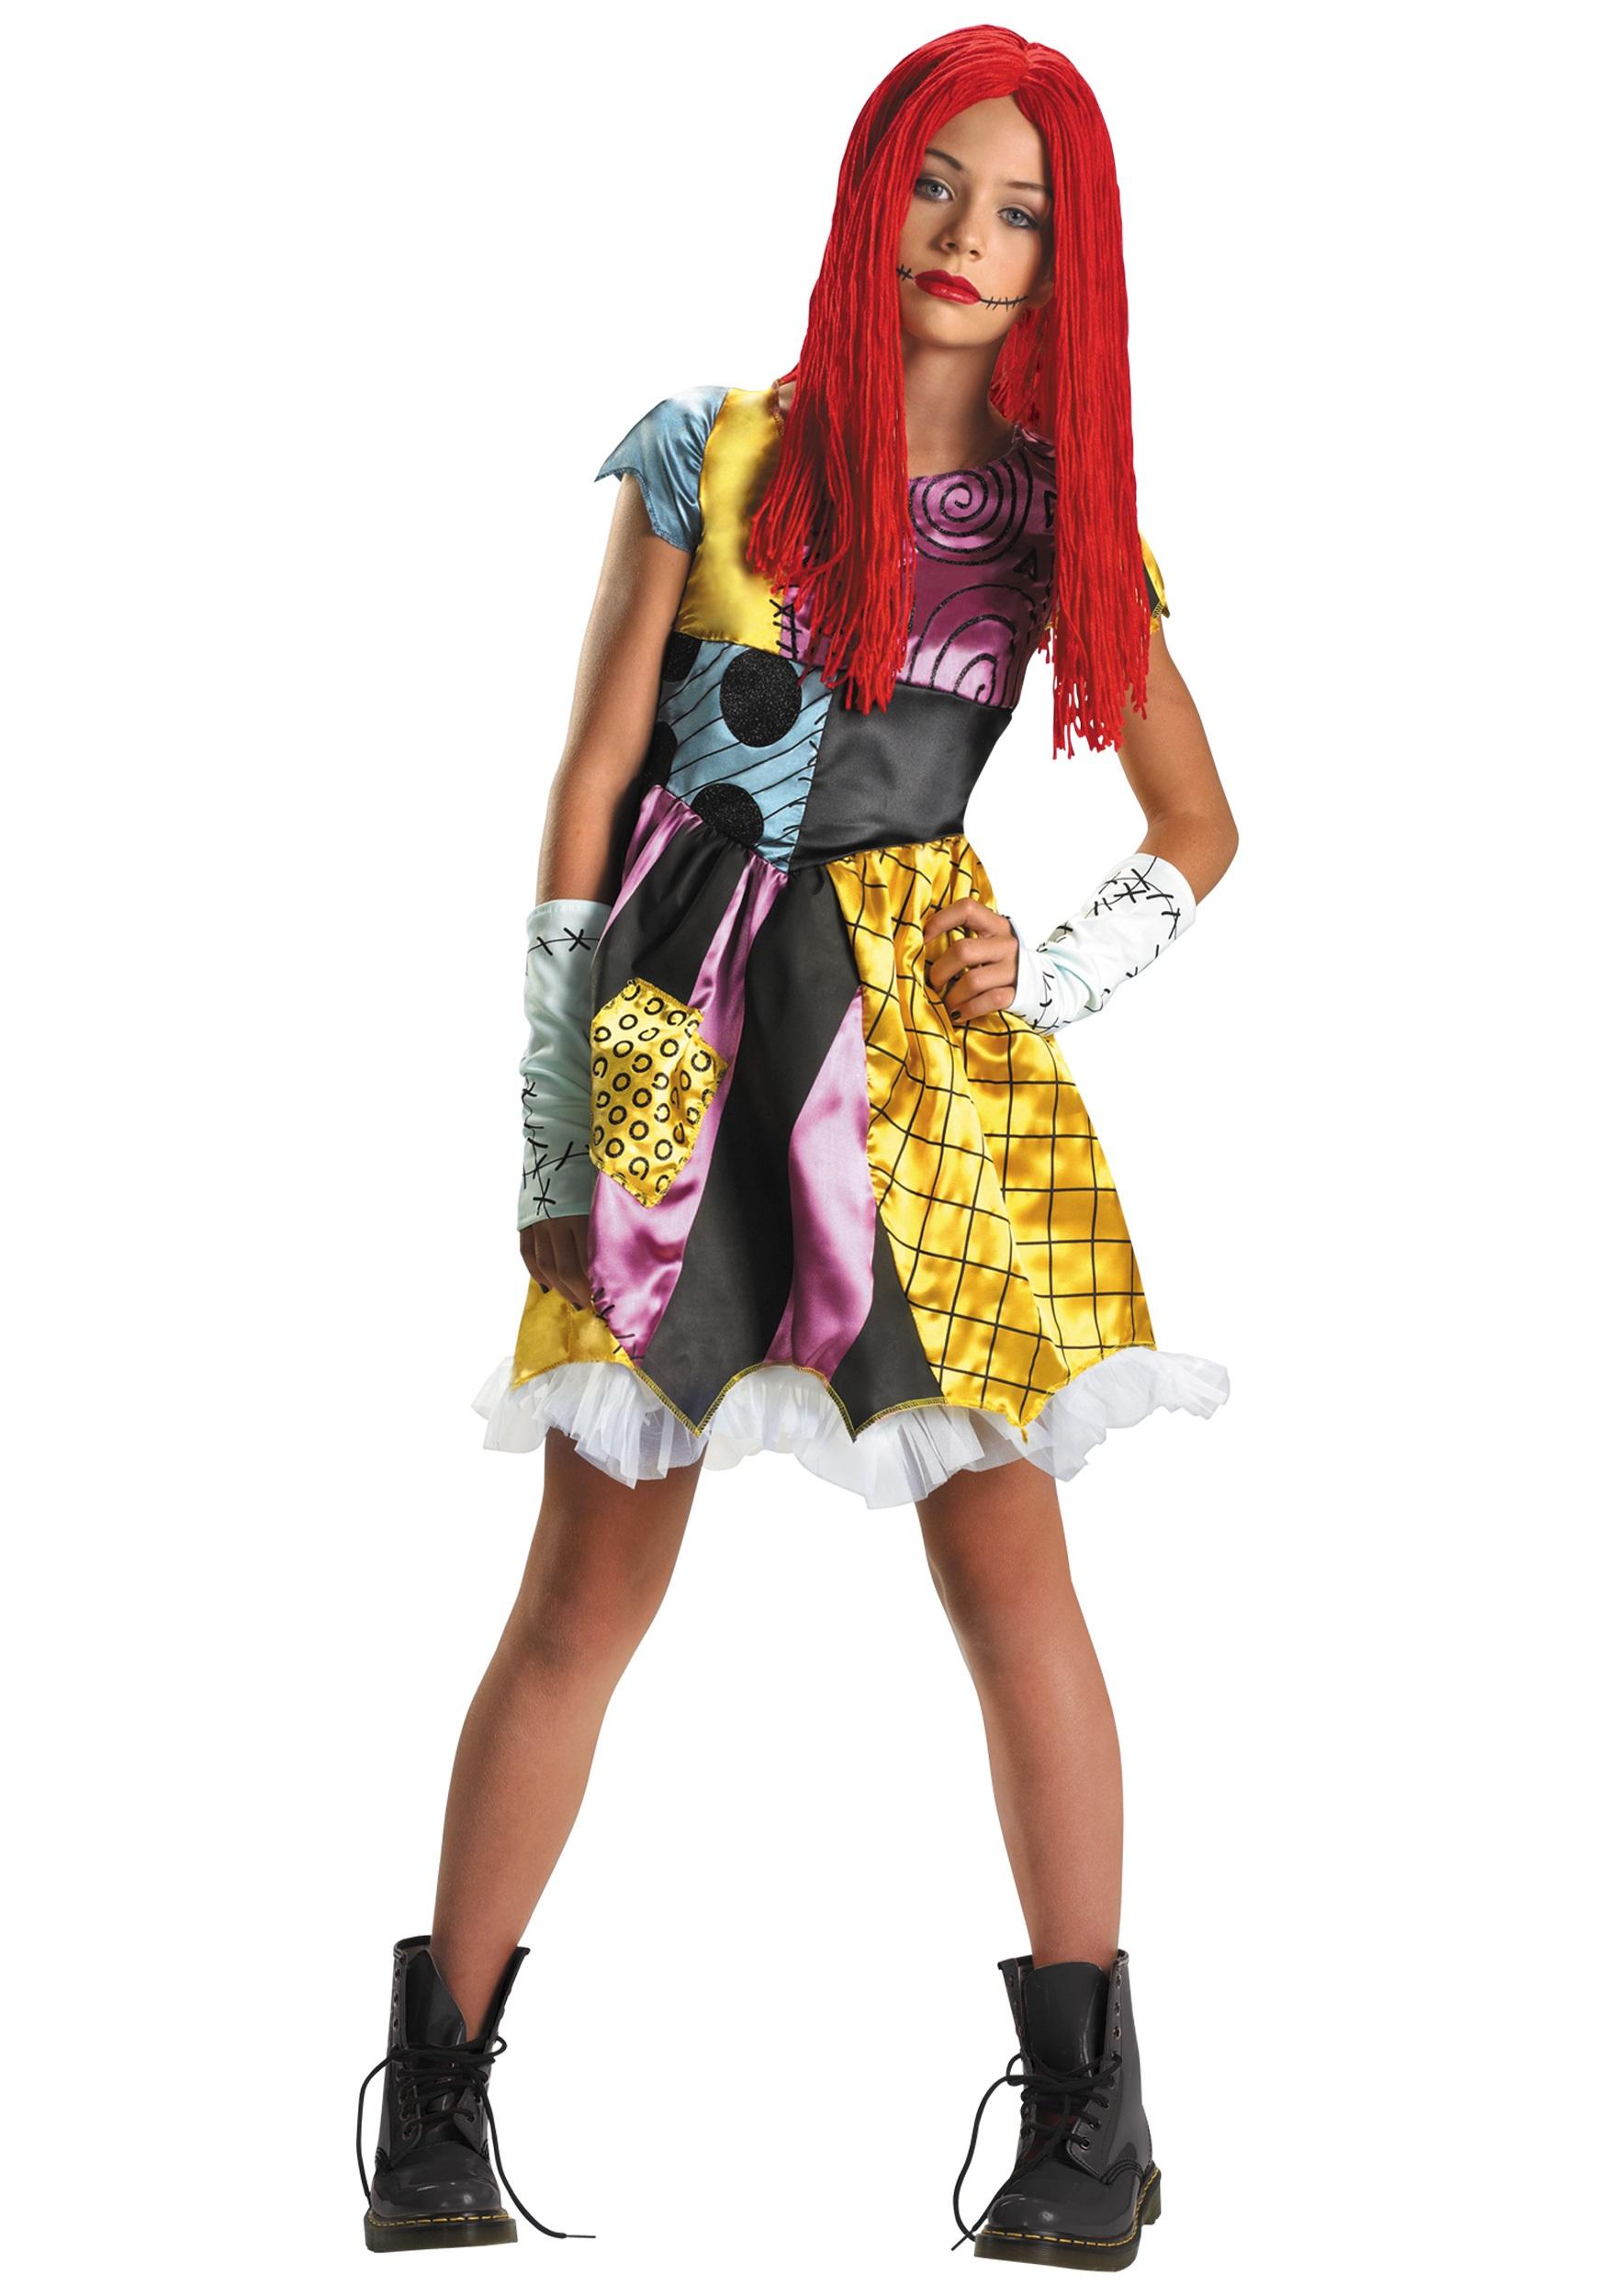 halloween costumes ideas for men: Doll Halloween Costume Ideas